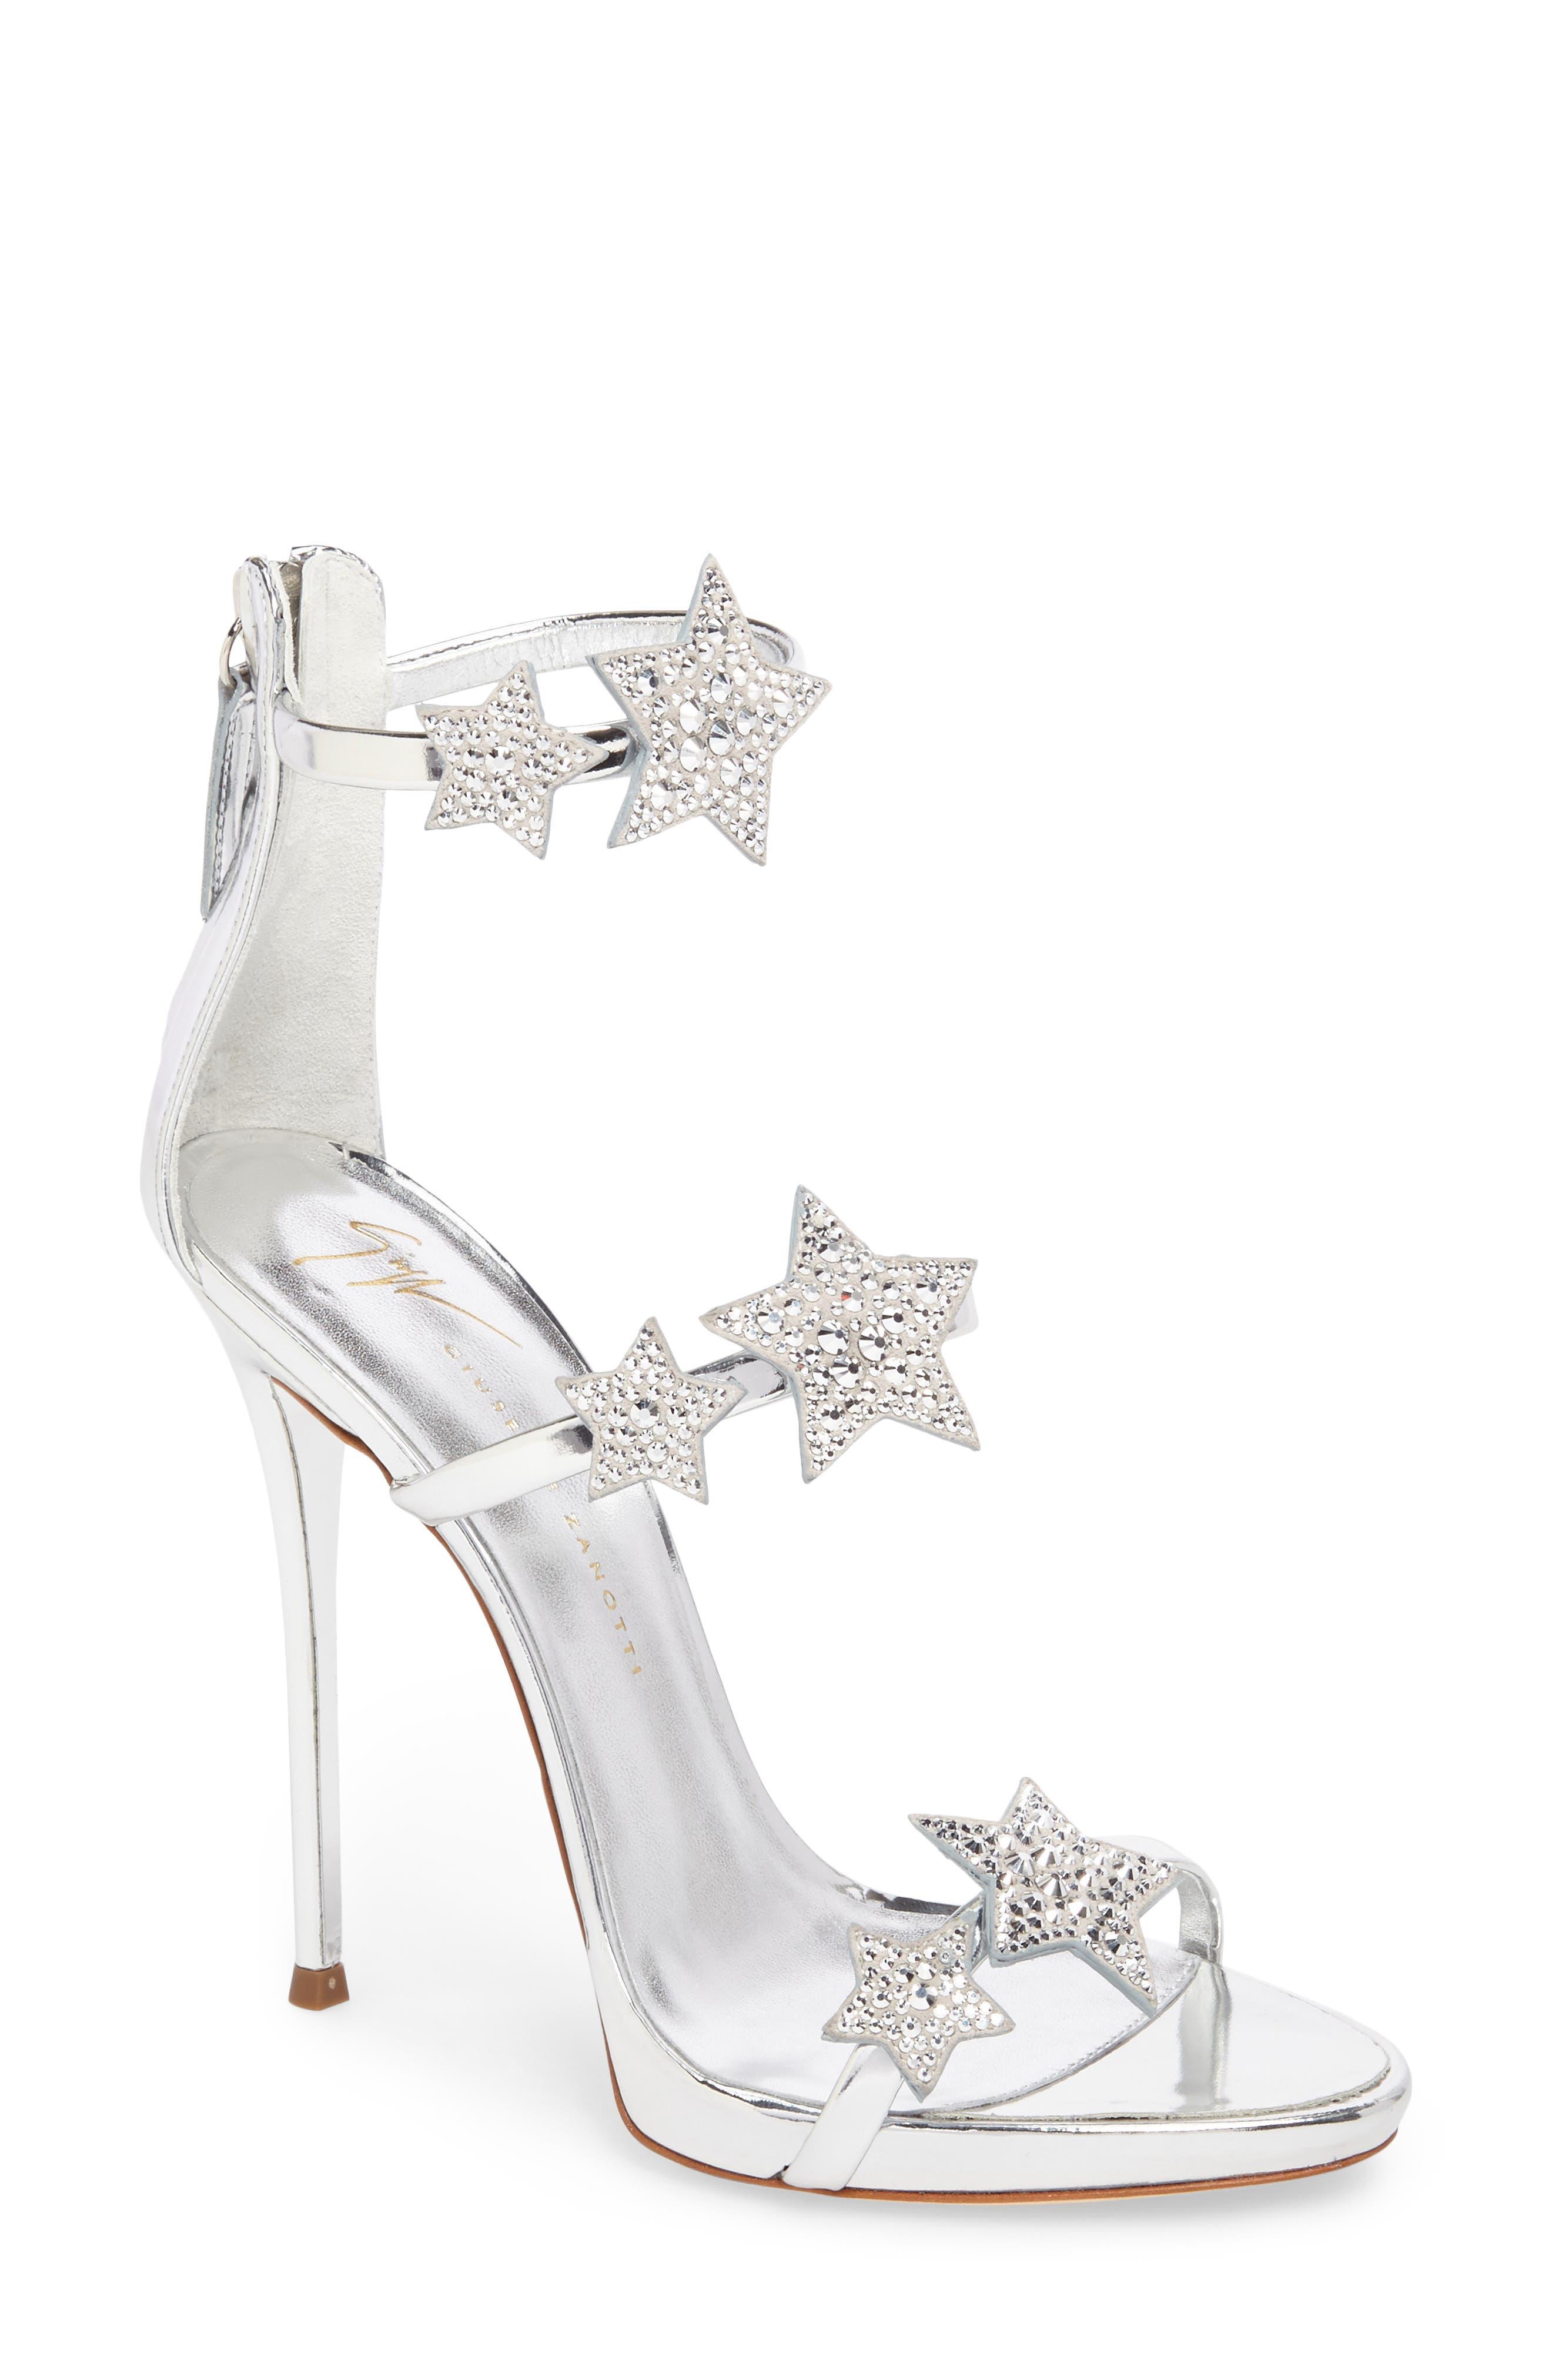 Main Image - Giuseppe Zanotti Coline Embellished Star Strap Sandal (Women)